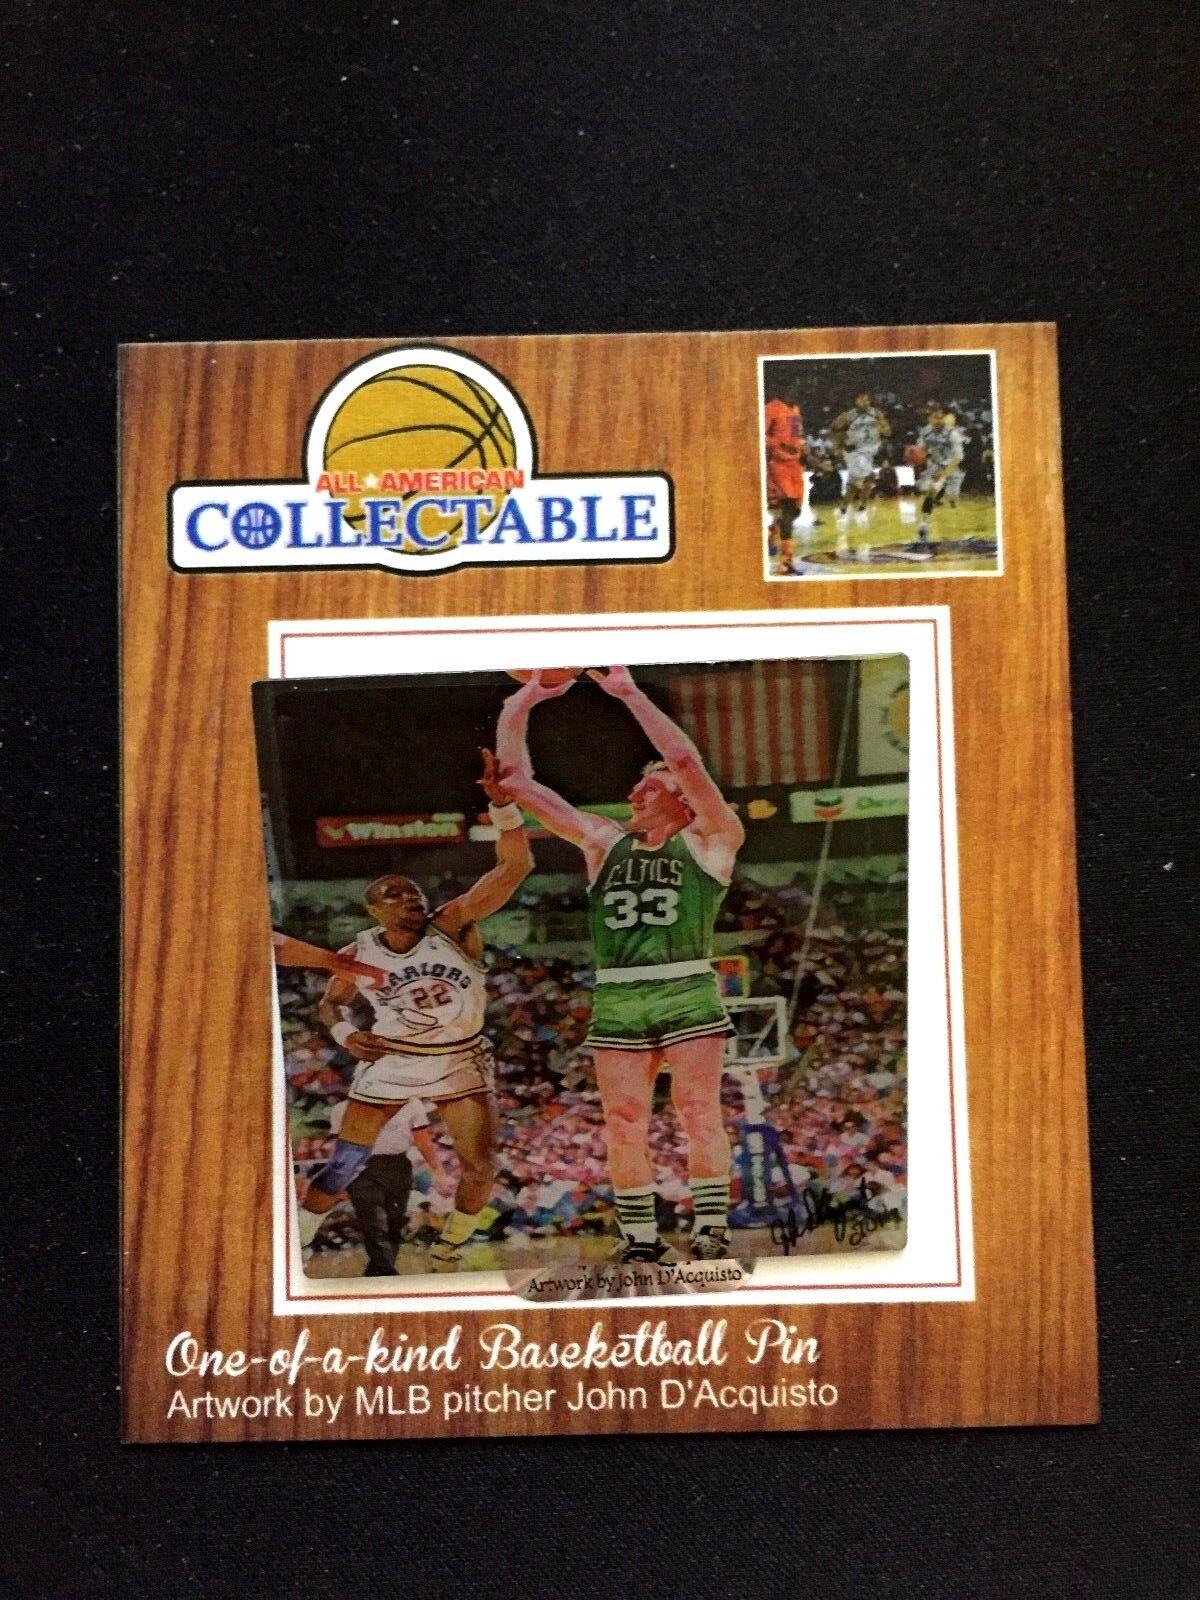 Boston Celtics Larry Bird Revers Pin-Limited Pin-Limited Pin-Limited Edition-2-CLASSIC Hartholz Legende    Günstige Bestellung  5459a6